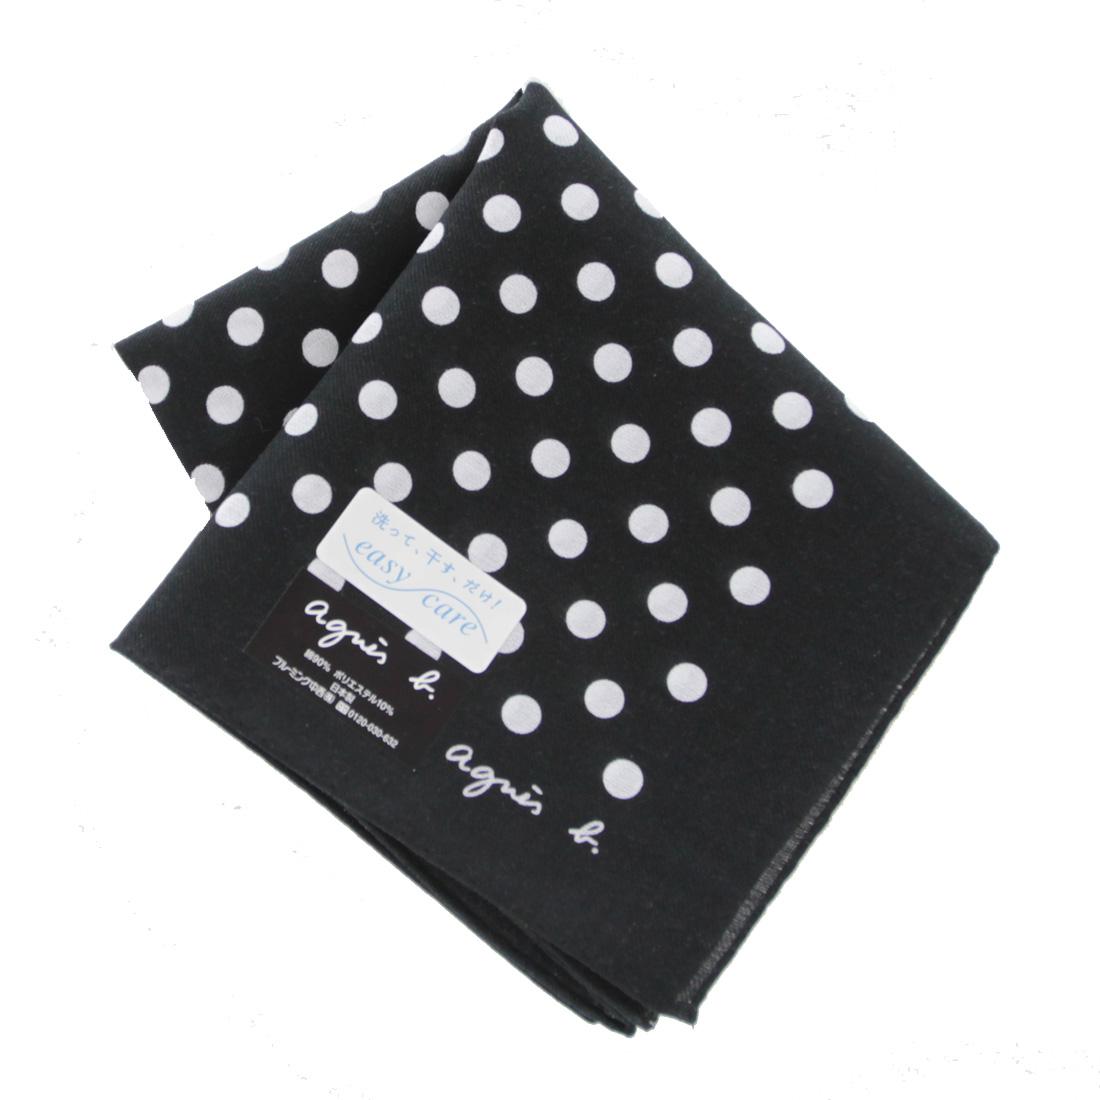 agnes b 本物◆ アニエスベー メンズ イージーケア ブラック プリントハンカチ 0252 販売